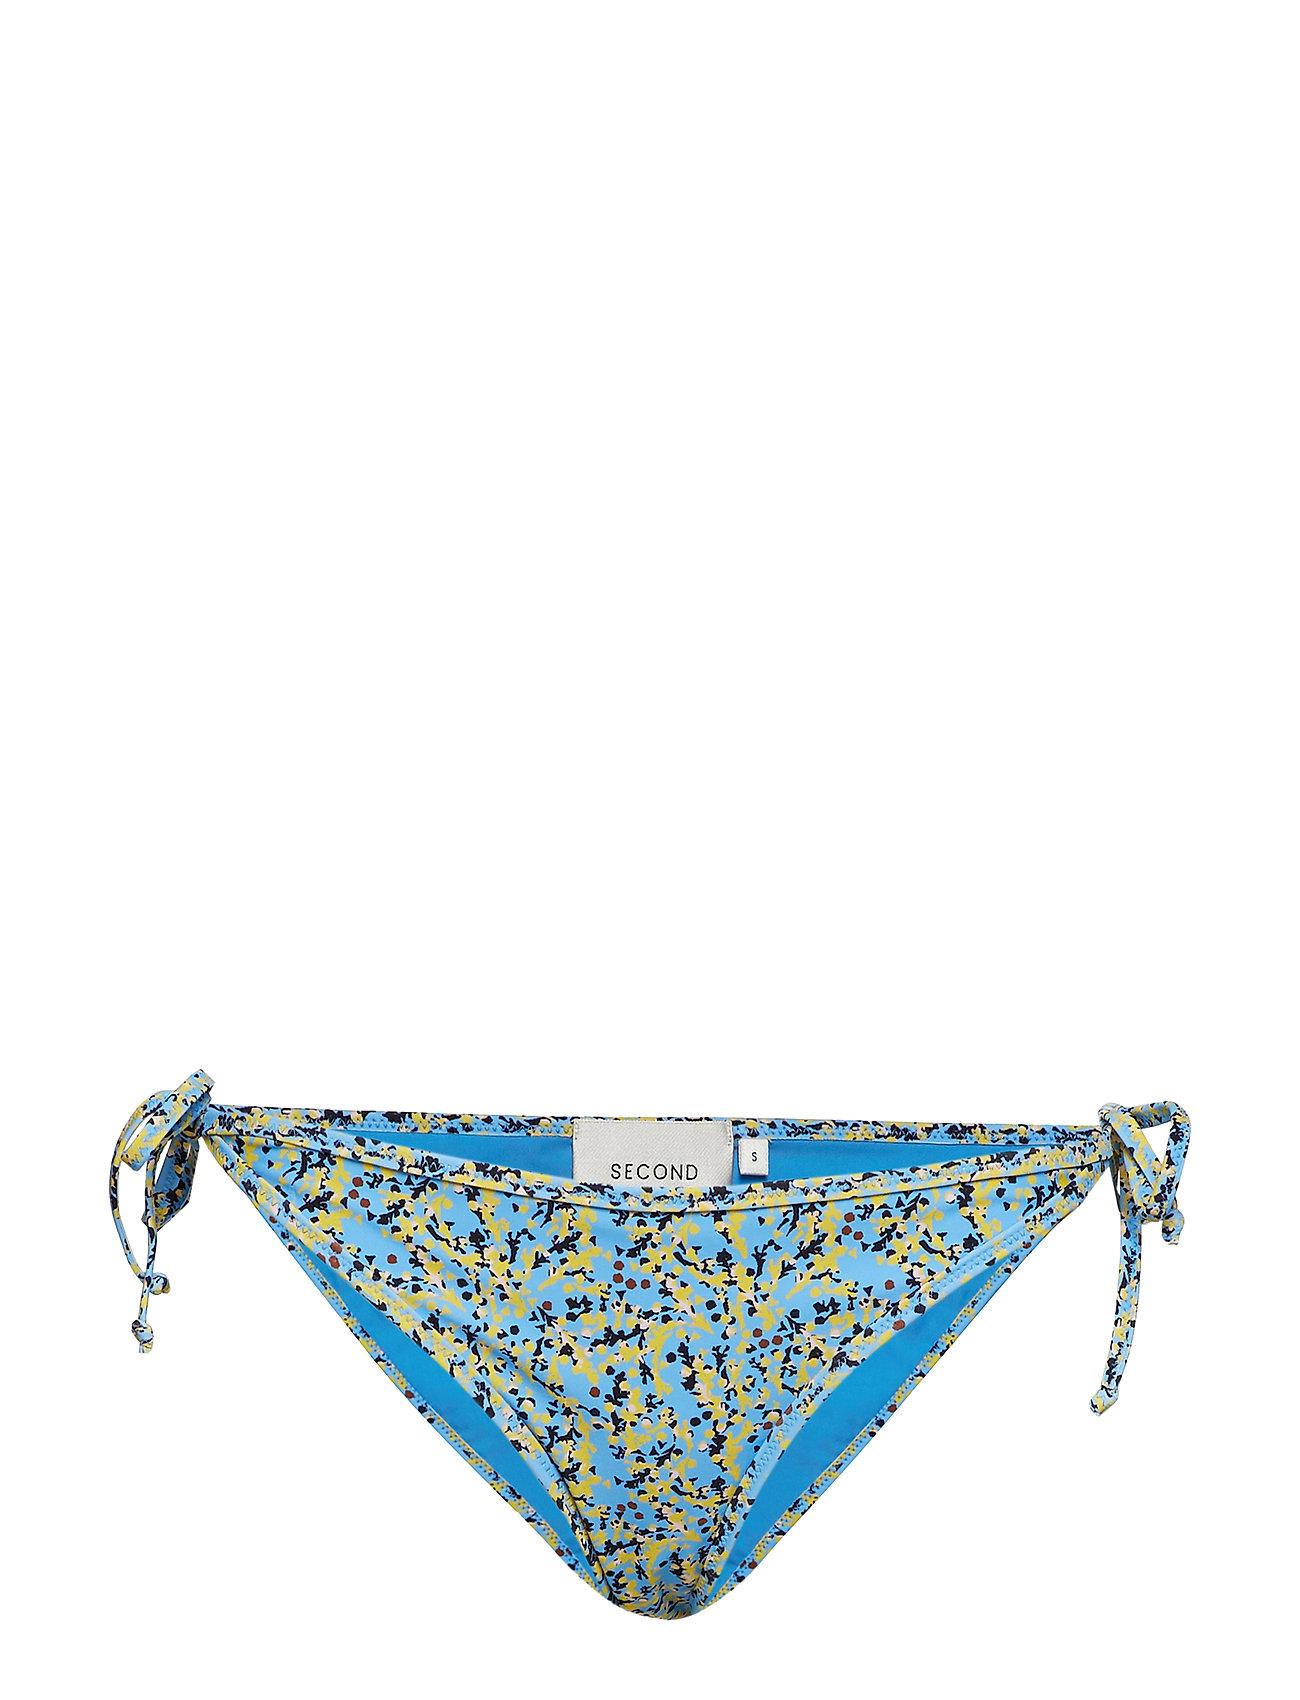 Lakota BlueSecond Bottomlittle Female Boy Bikini 0w8XnNZOPk